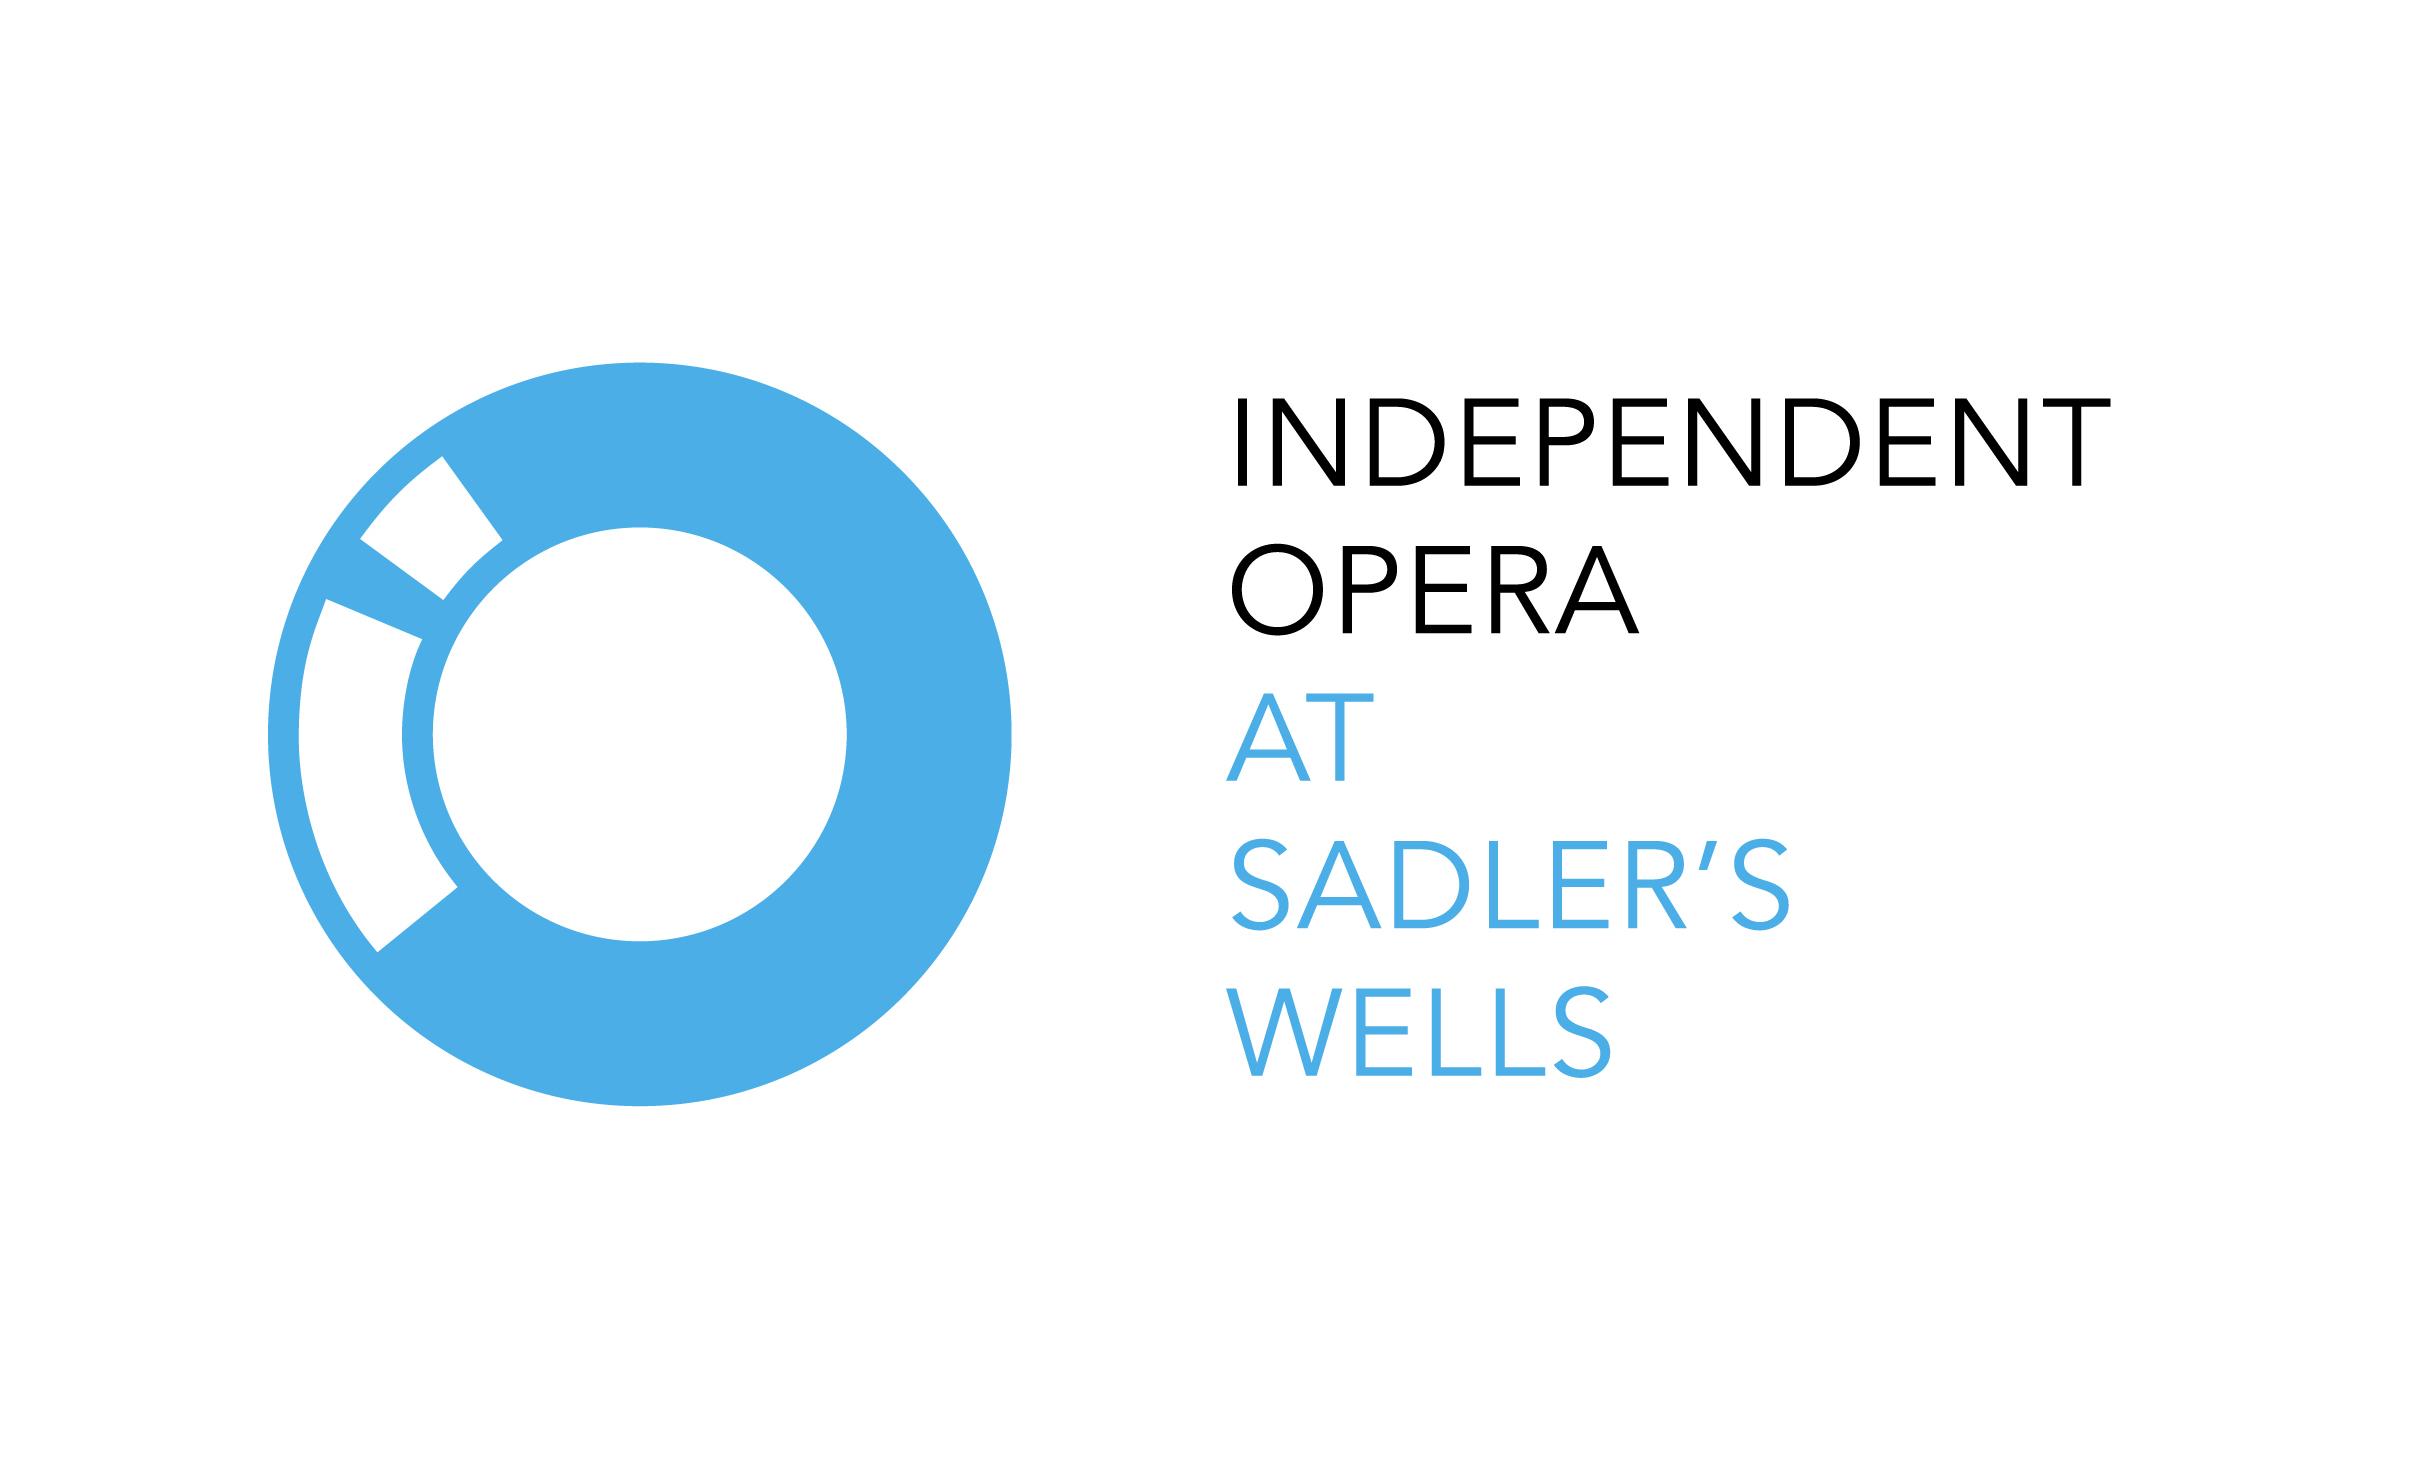 independent opera logo 2.jpg